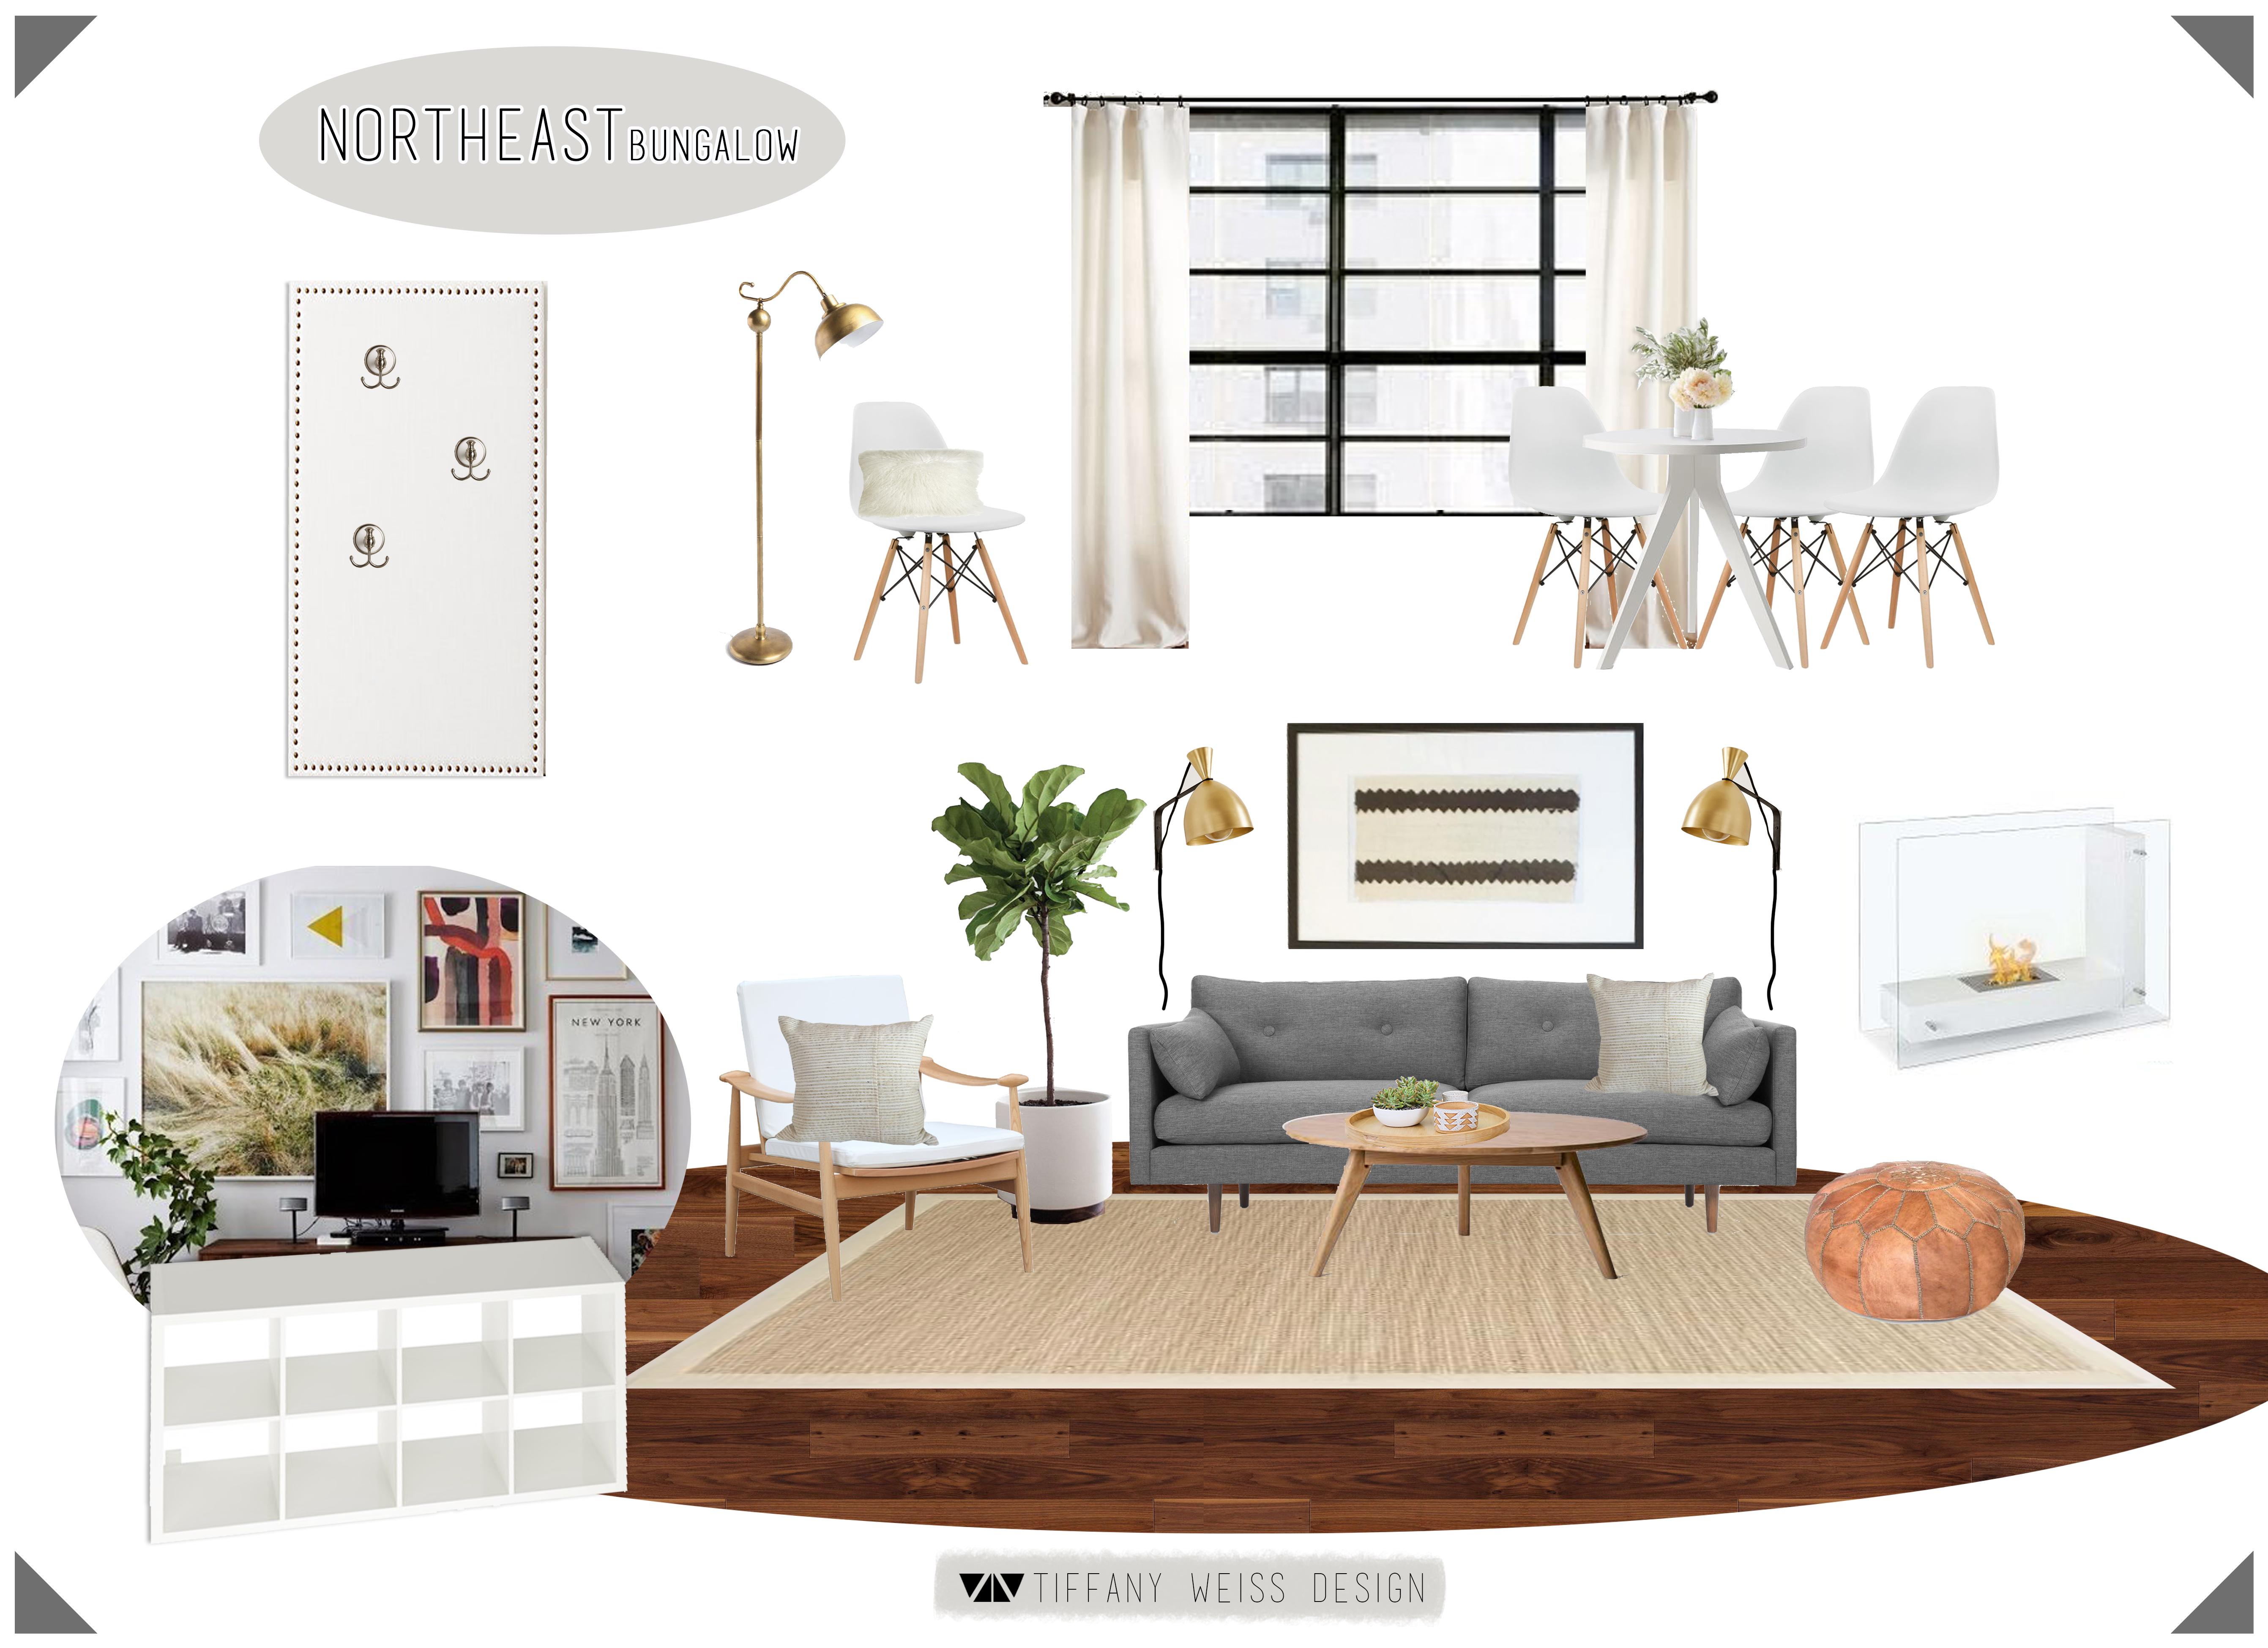 NE bungalow_design board3